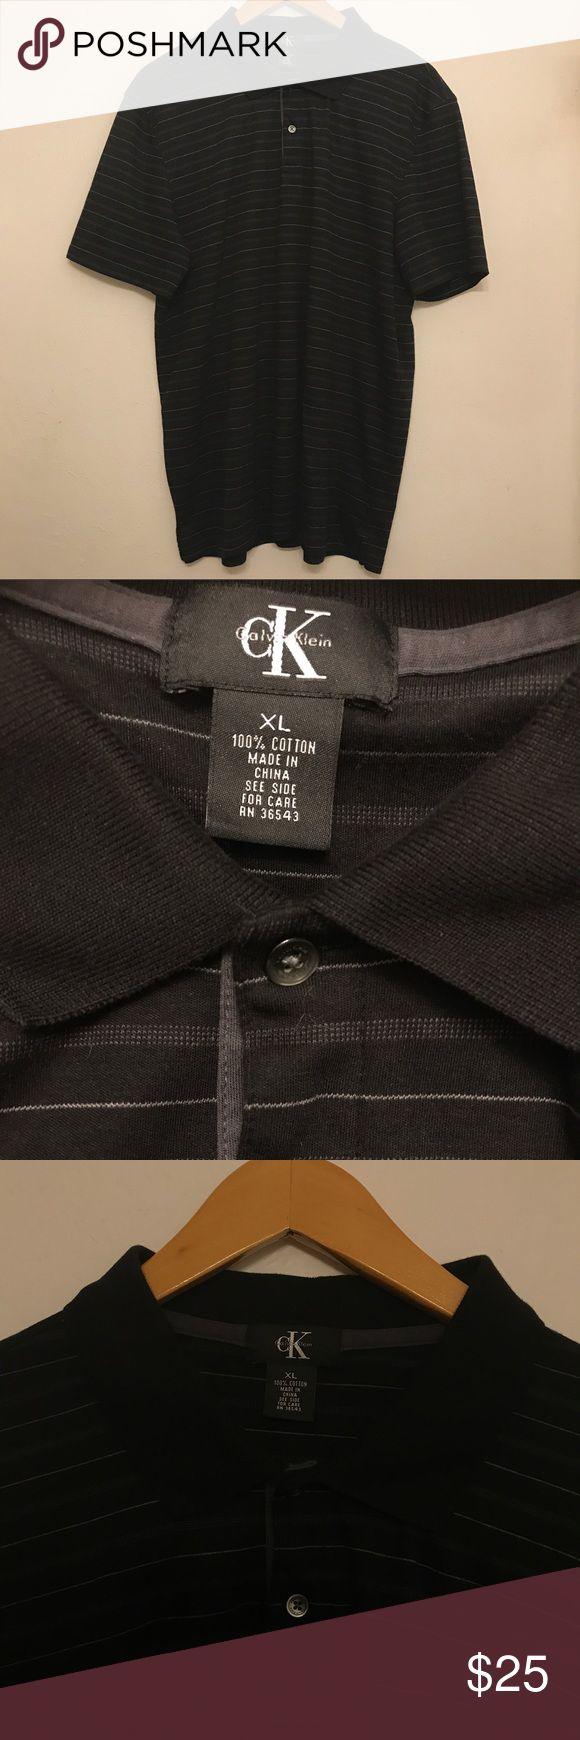 Men's XL Calvin Klein Striped Polo Shirt Xtra large men's polo shirt. Calvin Klein striped shirt. Good shirt for golfing in style or a shirt for work. 100% cotton. Very soft. Calvin Klein Shirts Polos